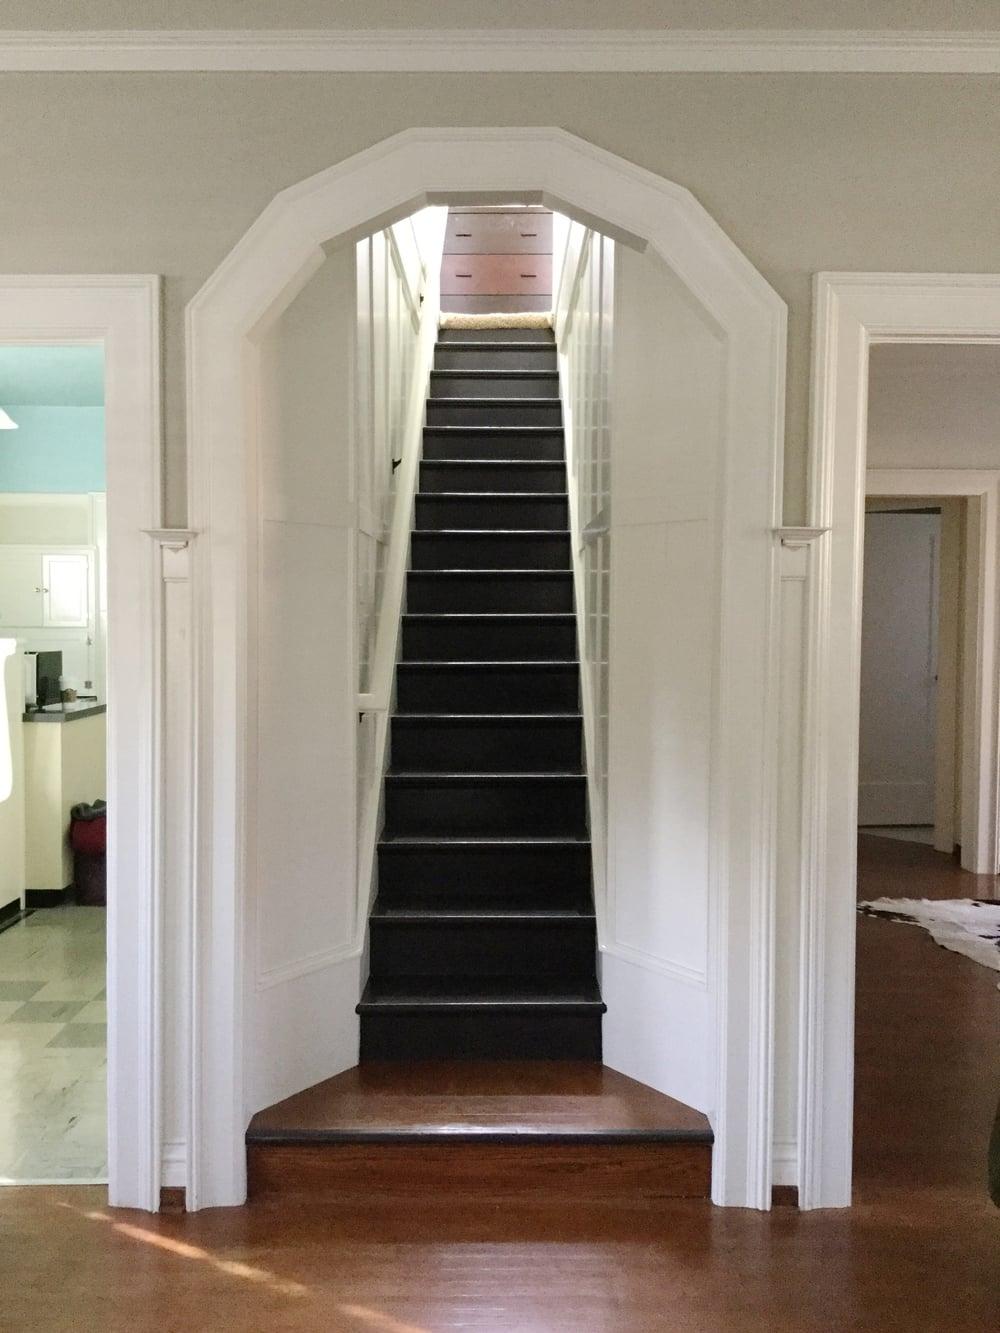 Lady steps.